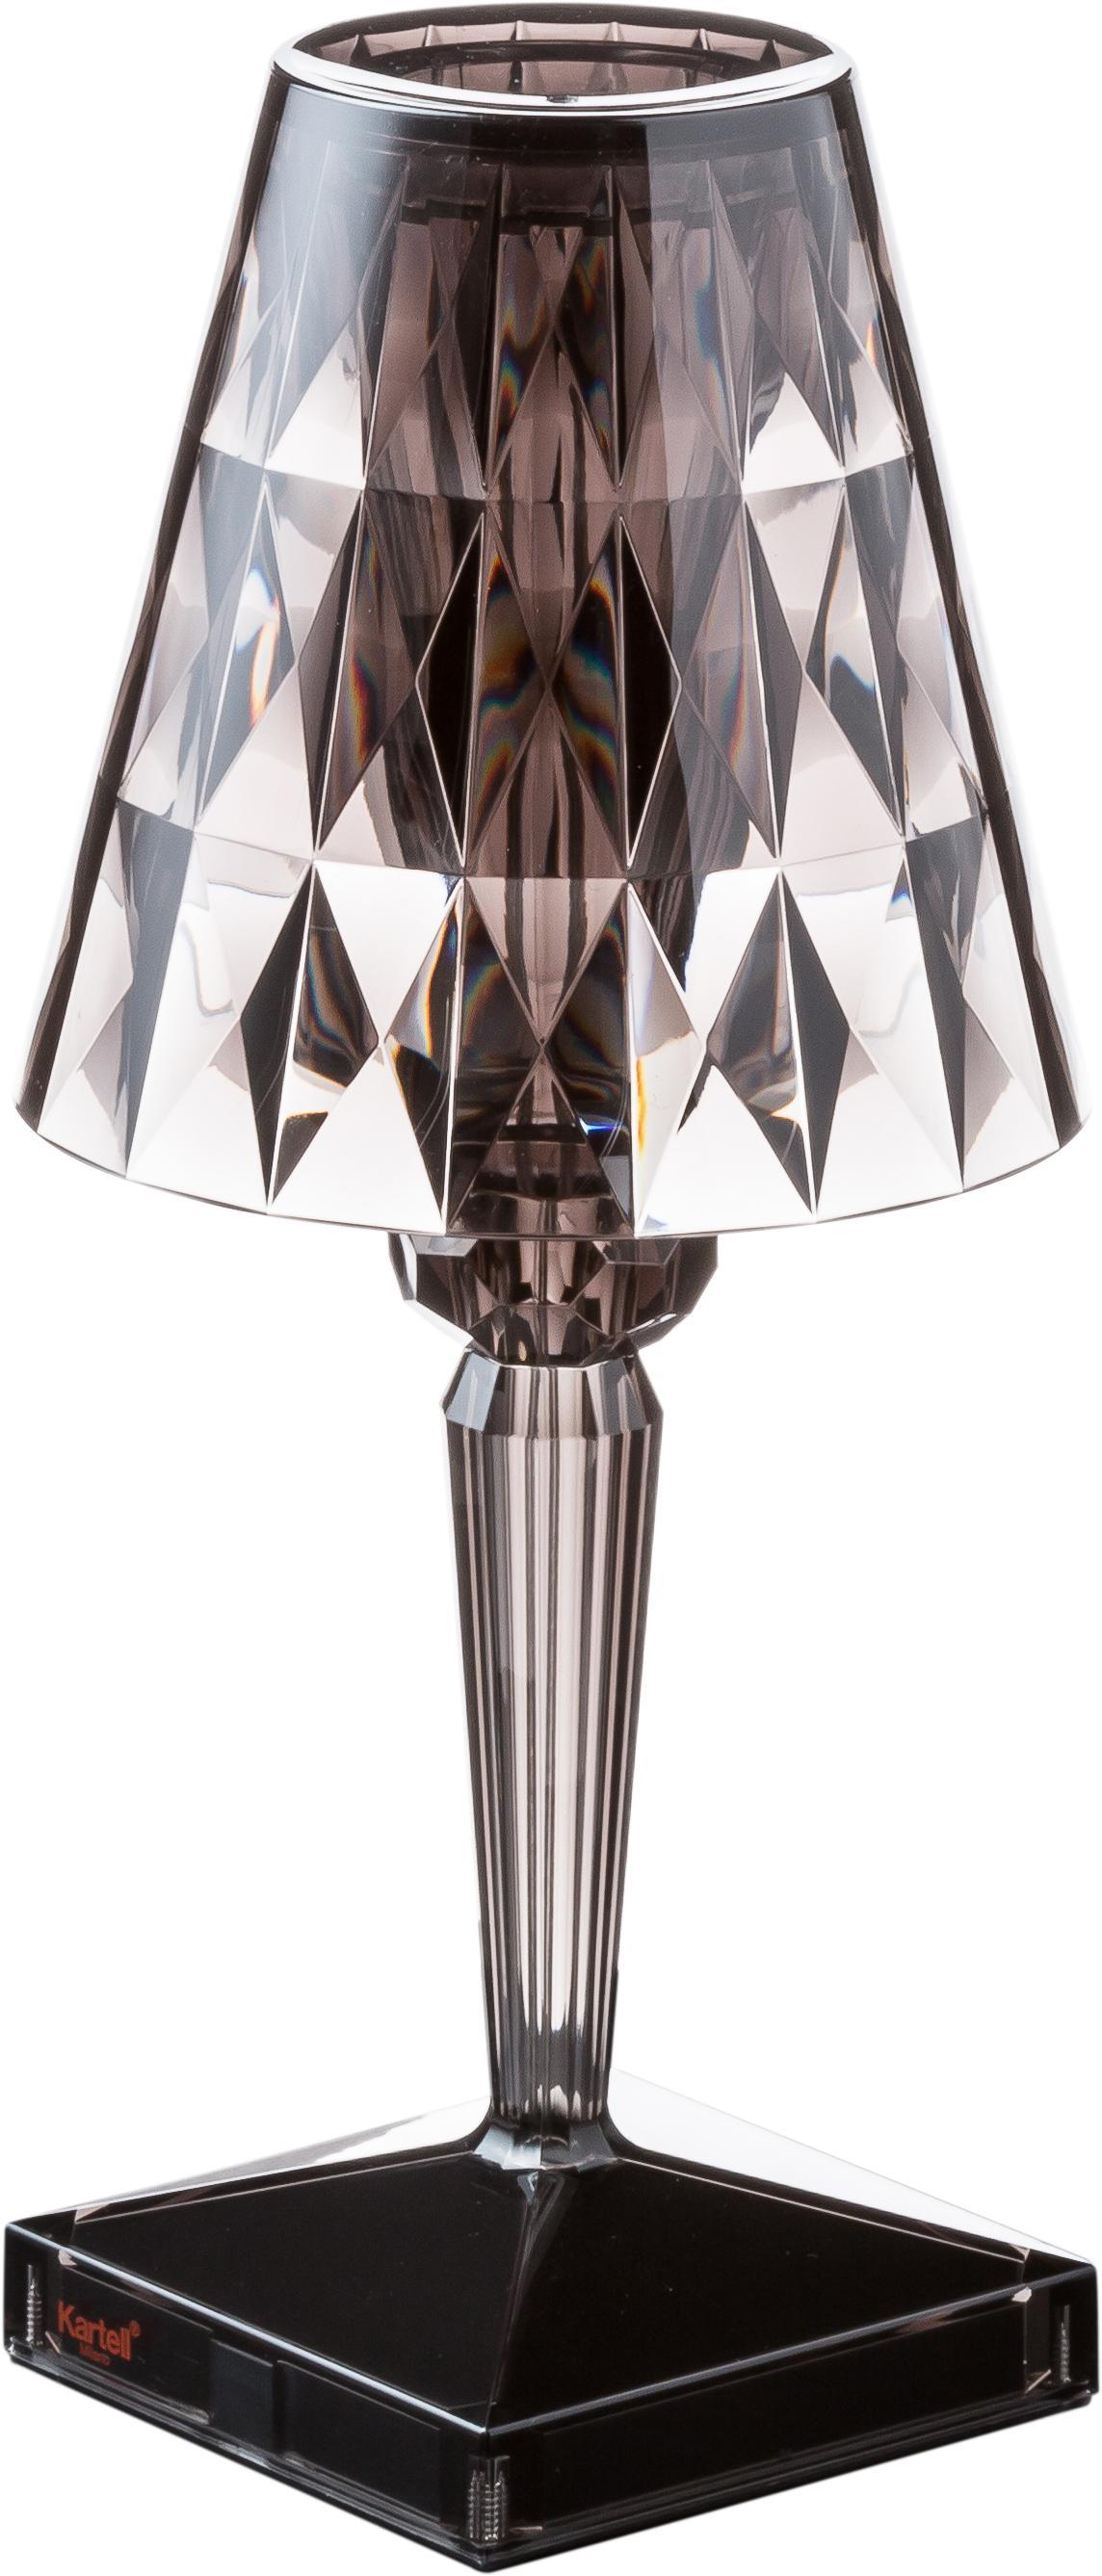 Design LED tafellamp Battery, Lampenkap: kunststof, Lampvoet: kunststof, Grijs, transparant, Ø 12 x H 26 cm